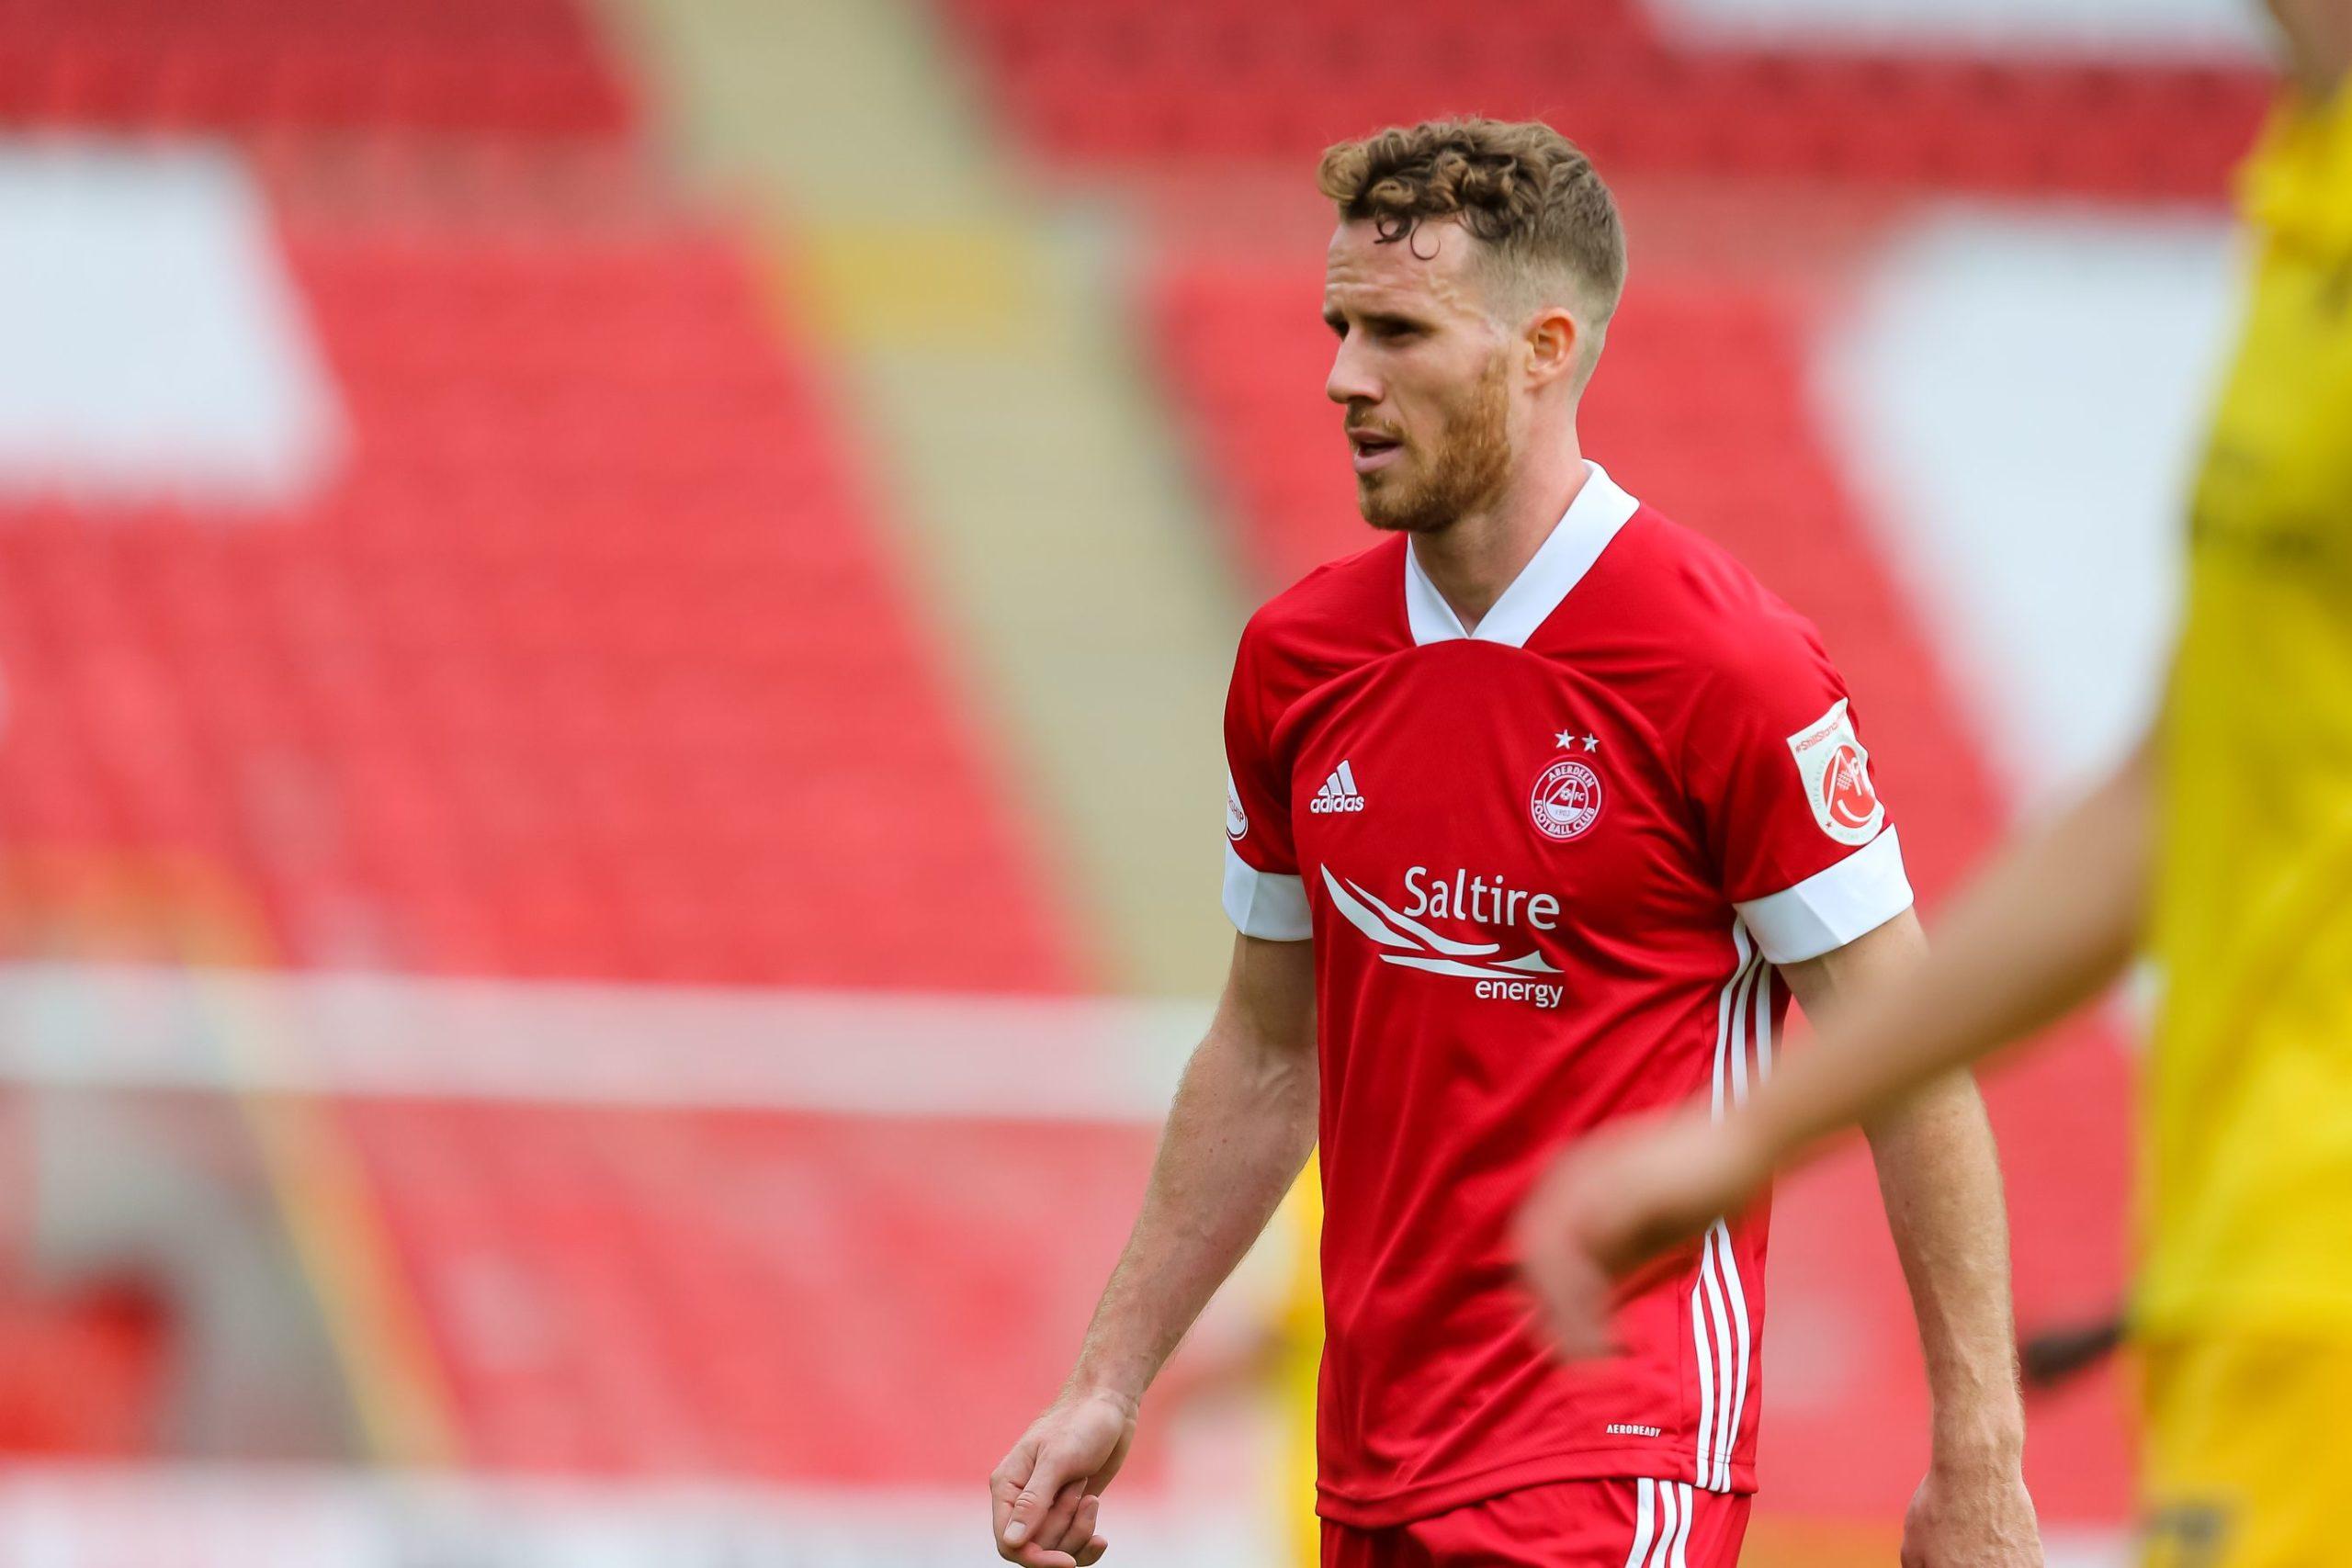 New Aberdeen signing, Bristol City loanee Marley Watkins.